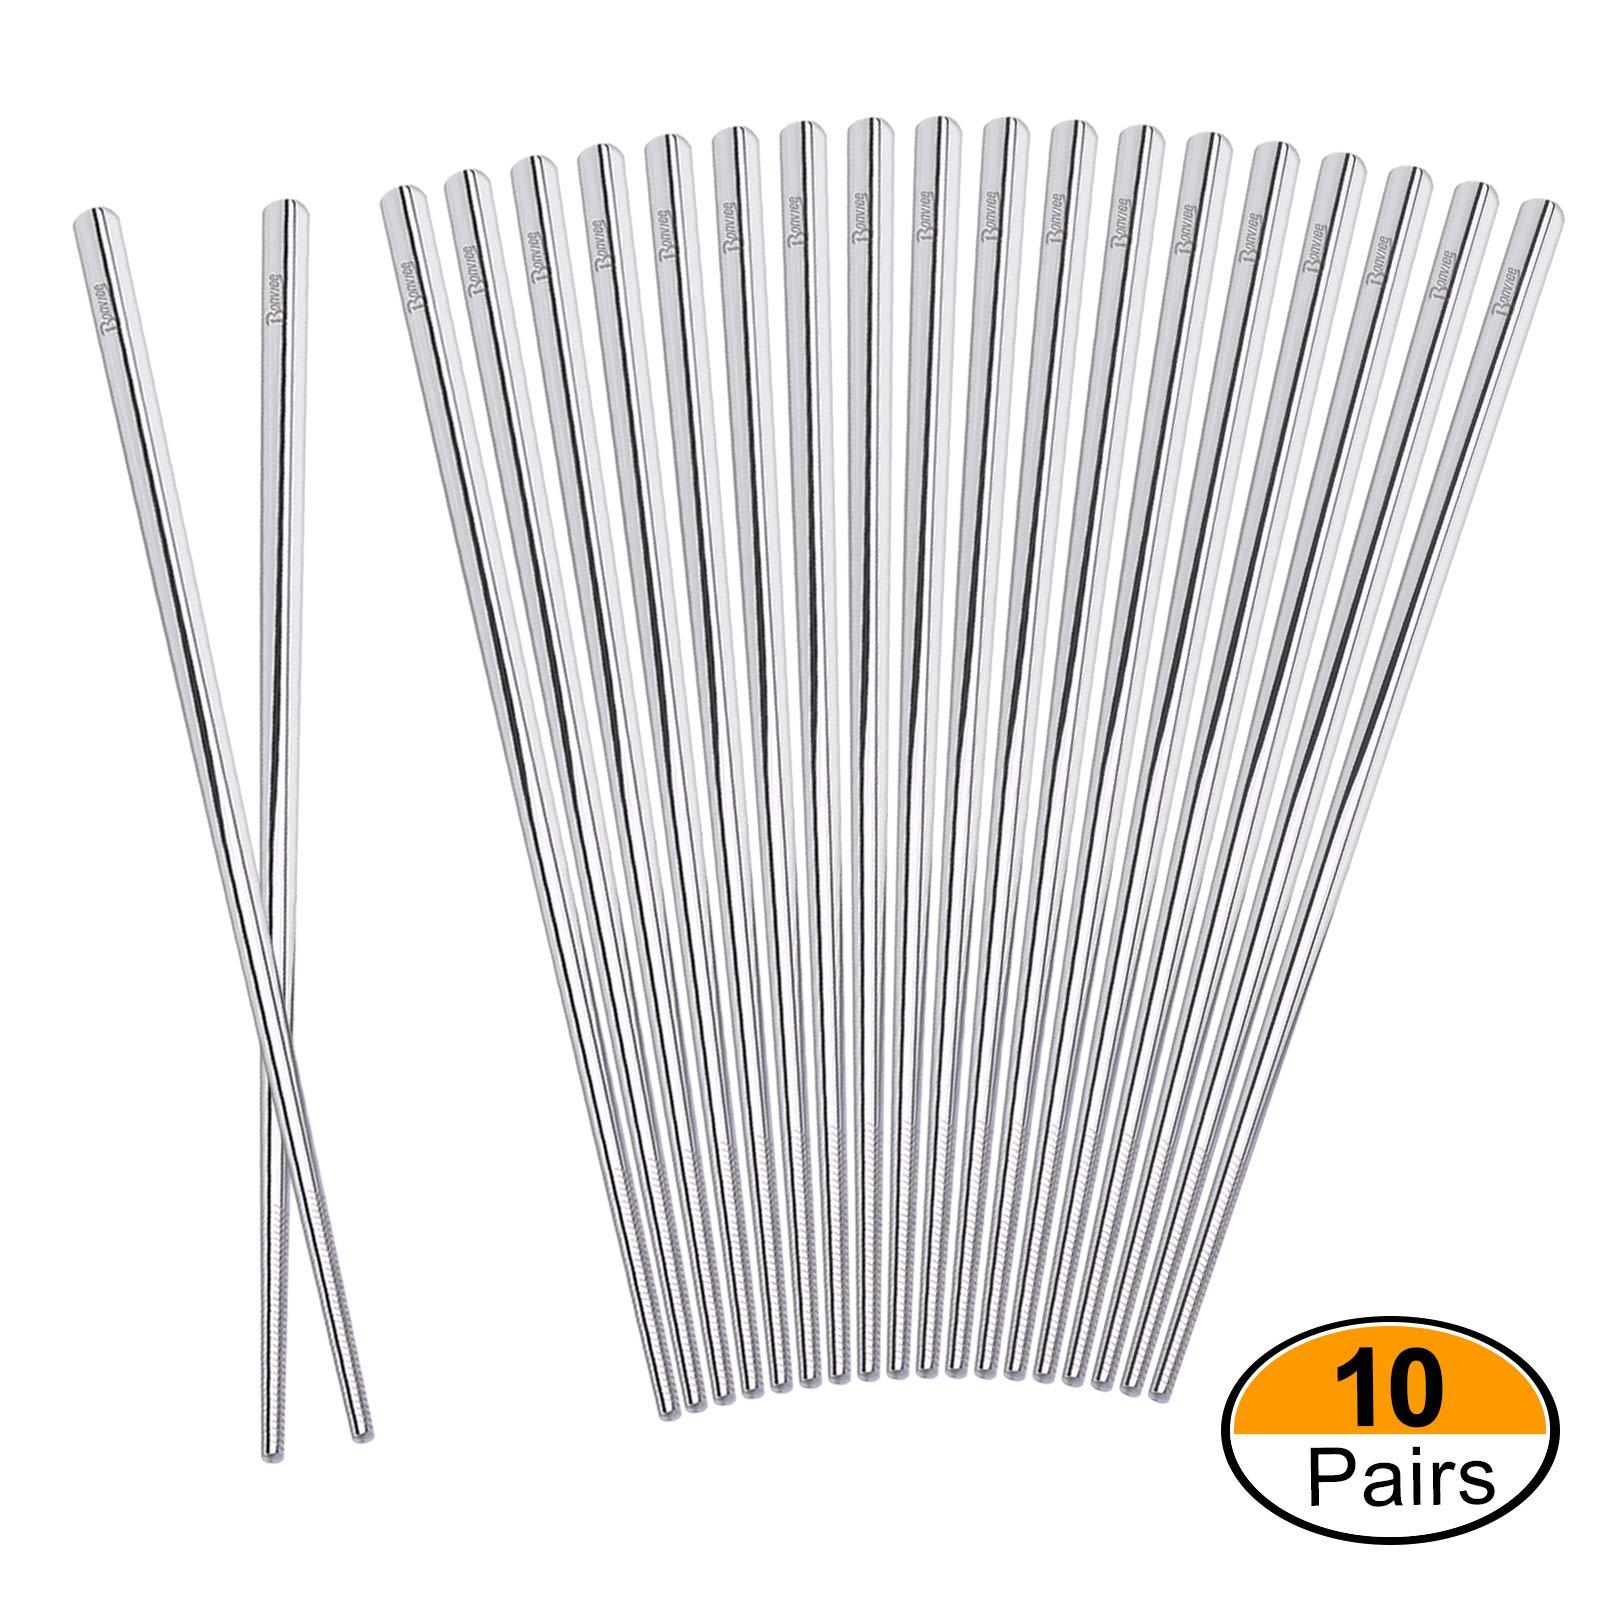 Bonviee Metal Chopsticks Reusable 304 Stainless Steel Chopsticks Set Dishwasher Safe 9.05 Inch Non-Slip for Household Hotel Resturant (10 Pairs)